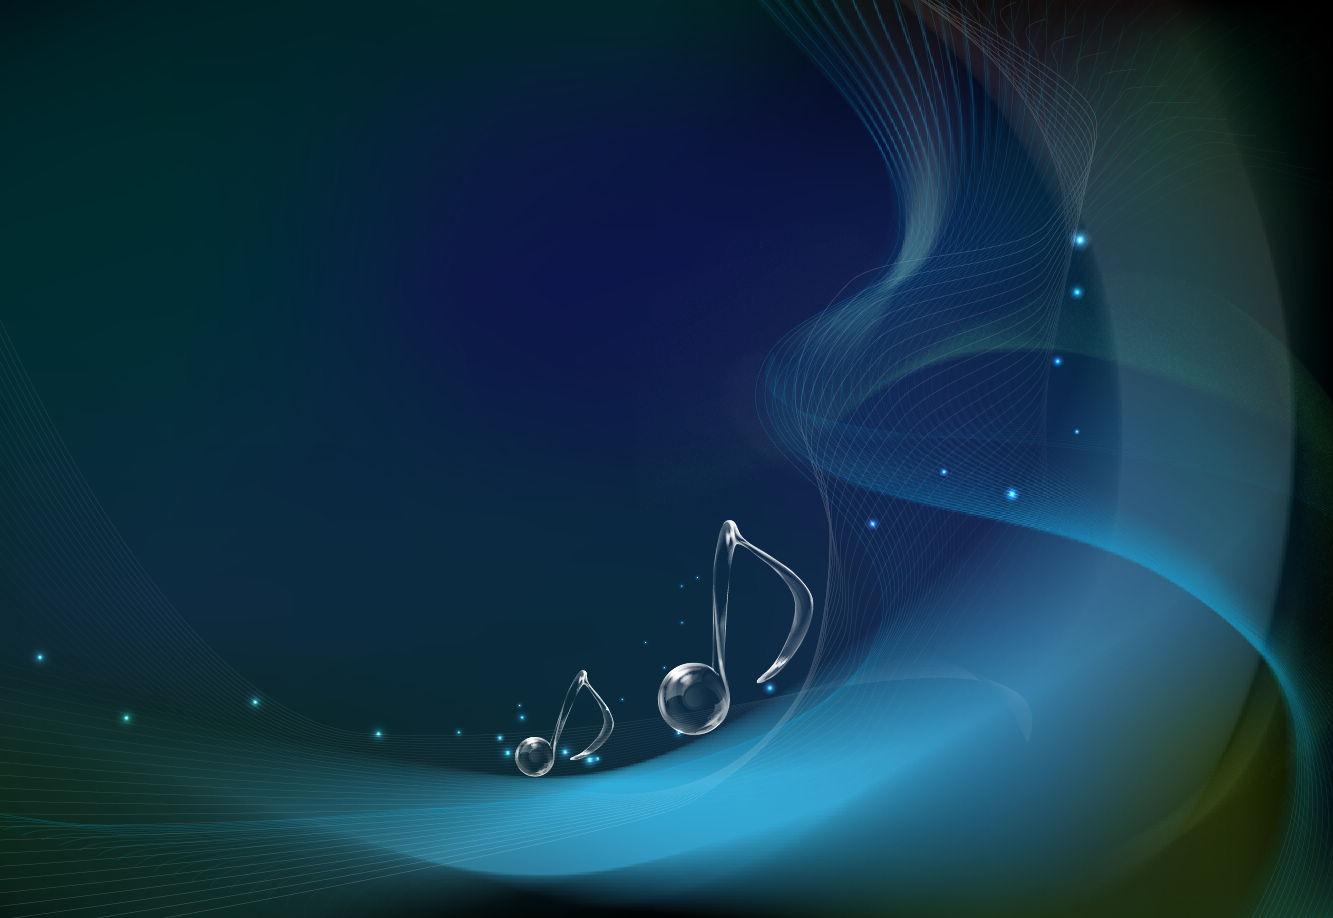 Music Notes Wallpaper: Blue Music Notes Wallpaper